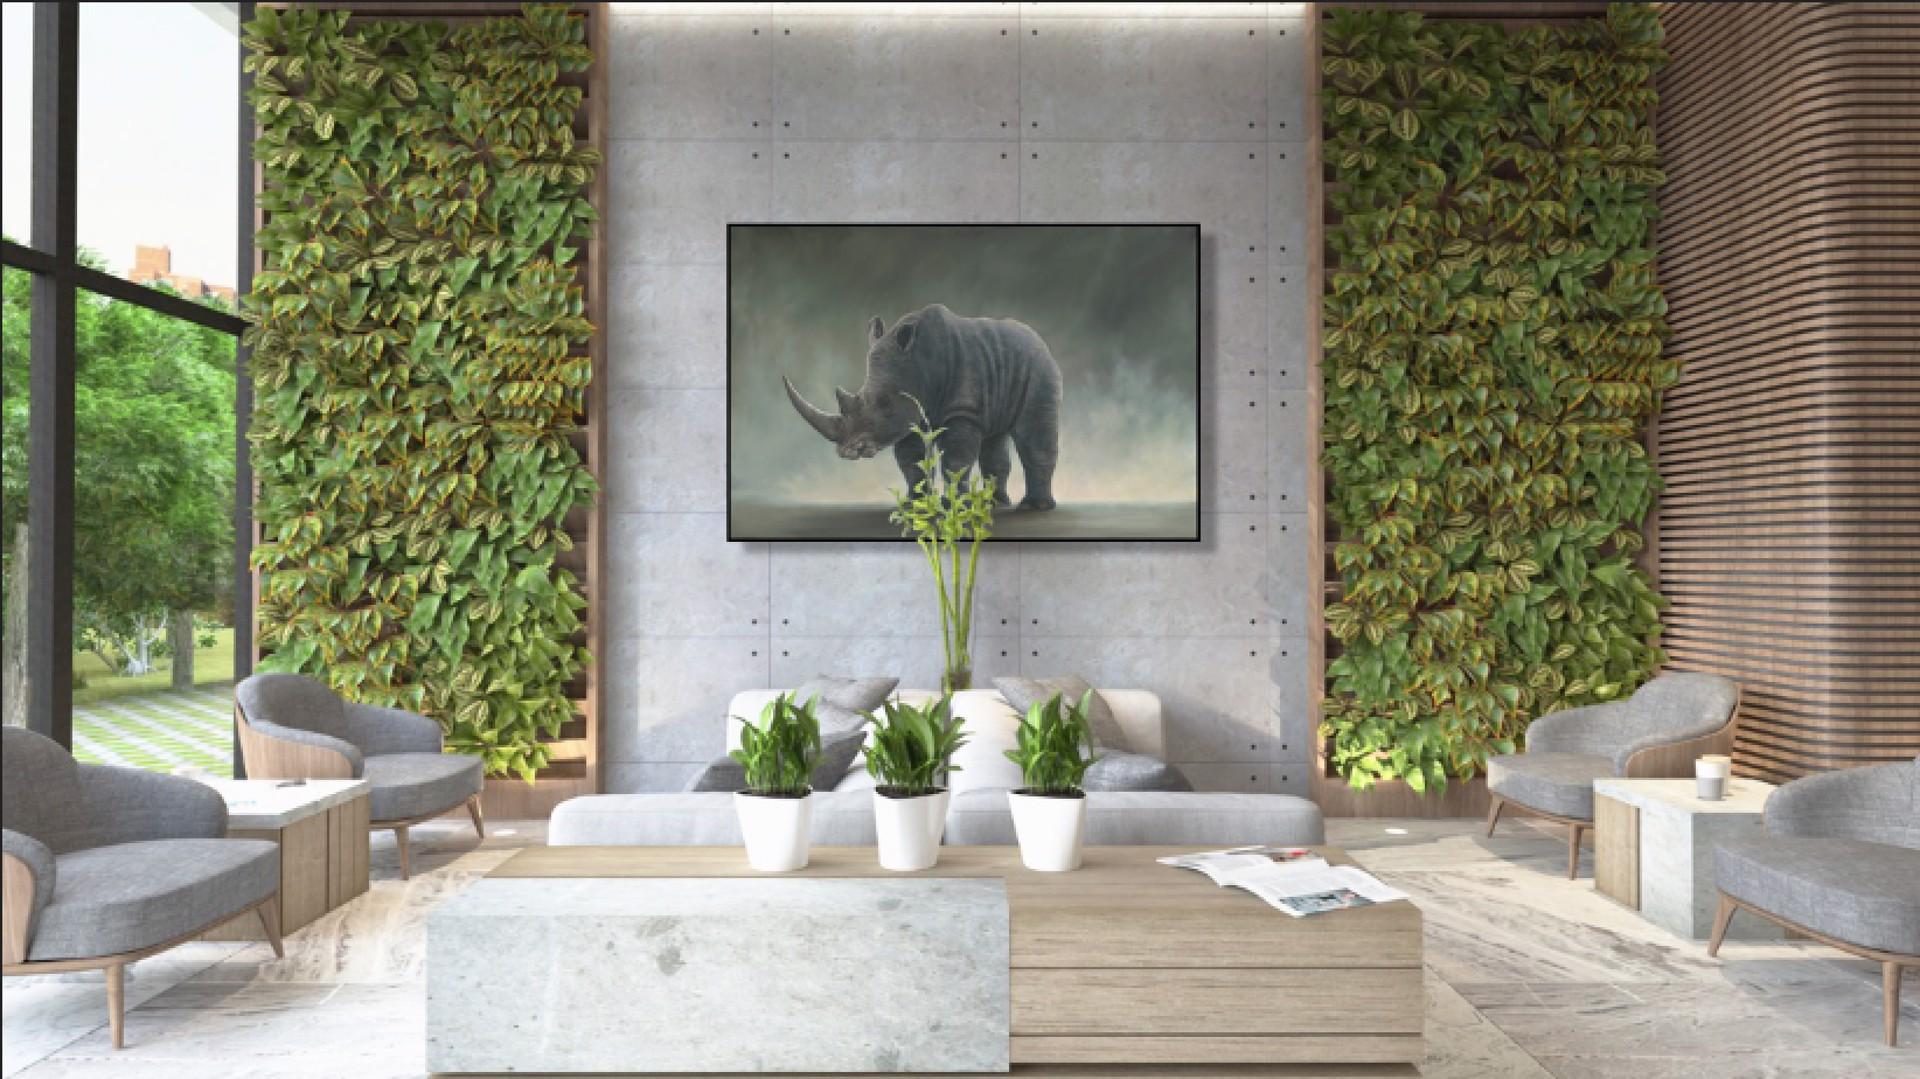 Robert Bissell, Fine Art, Bears, Original, Limited Edition, Canvas, Prints, Bears, Rabbits, Elephants, artwork, Robert Bissle, Robert Bissel